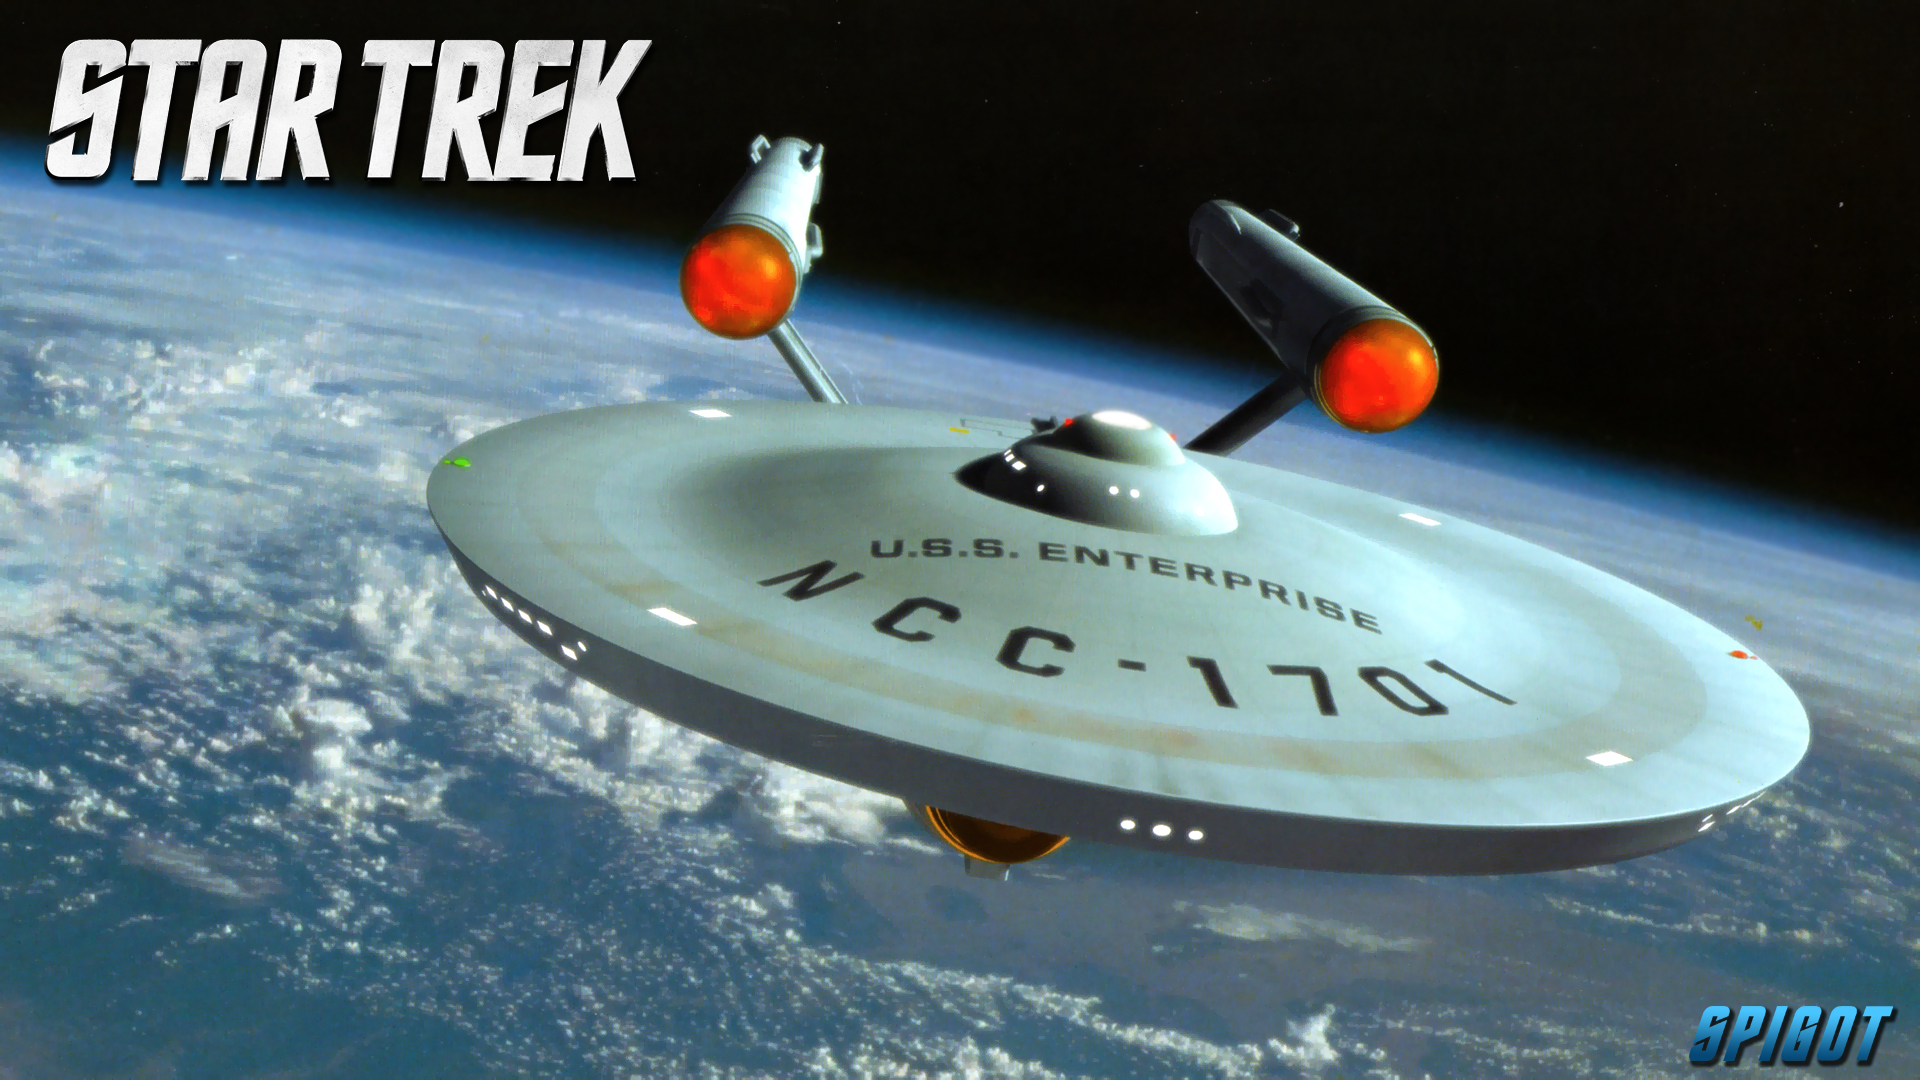 Star Trek Ships Wallpapers 1920x1080